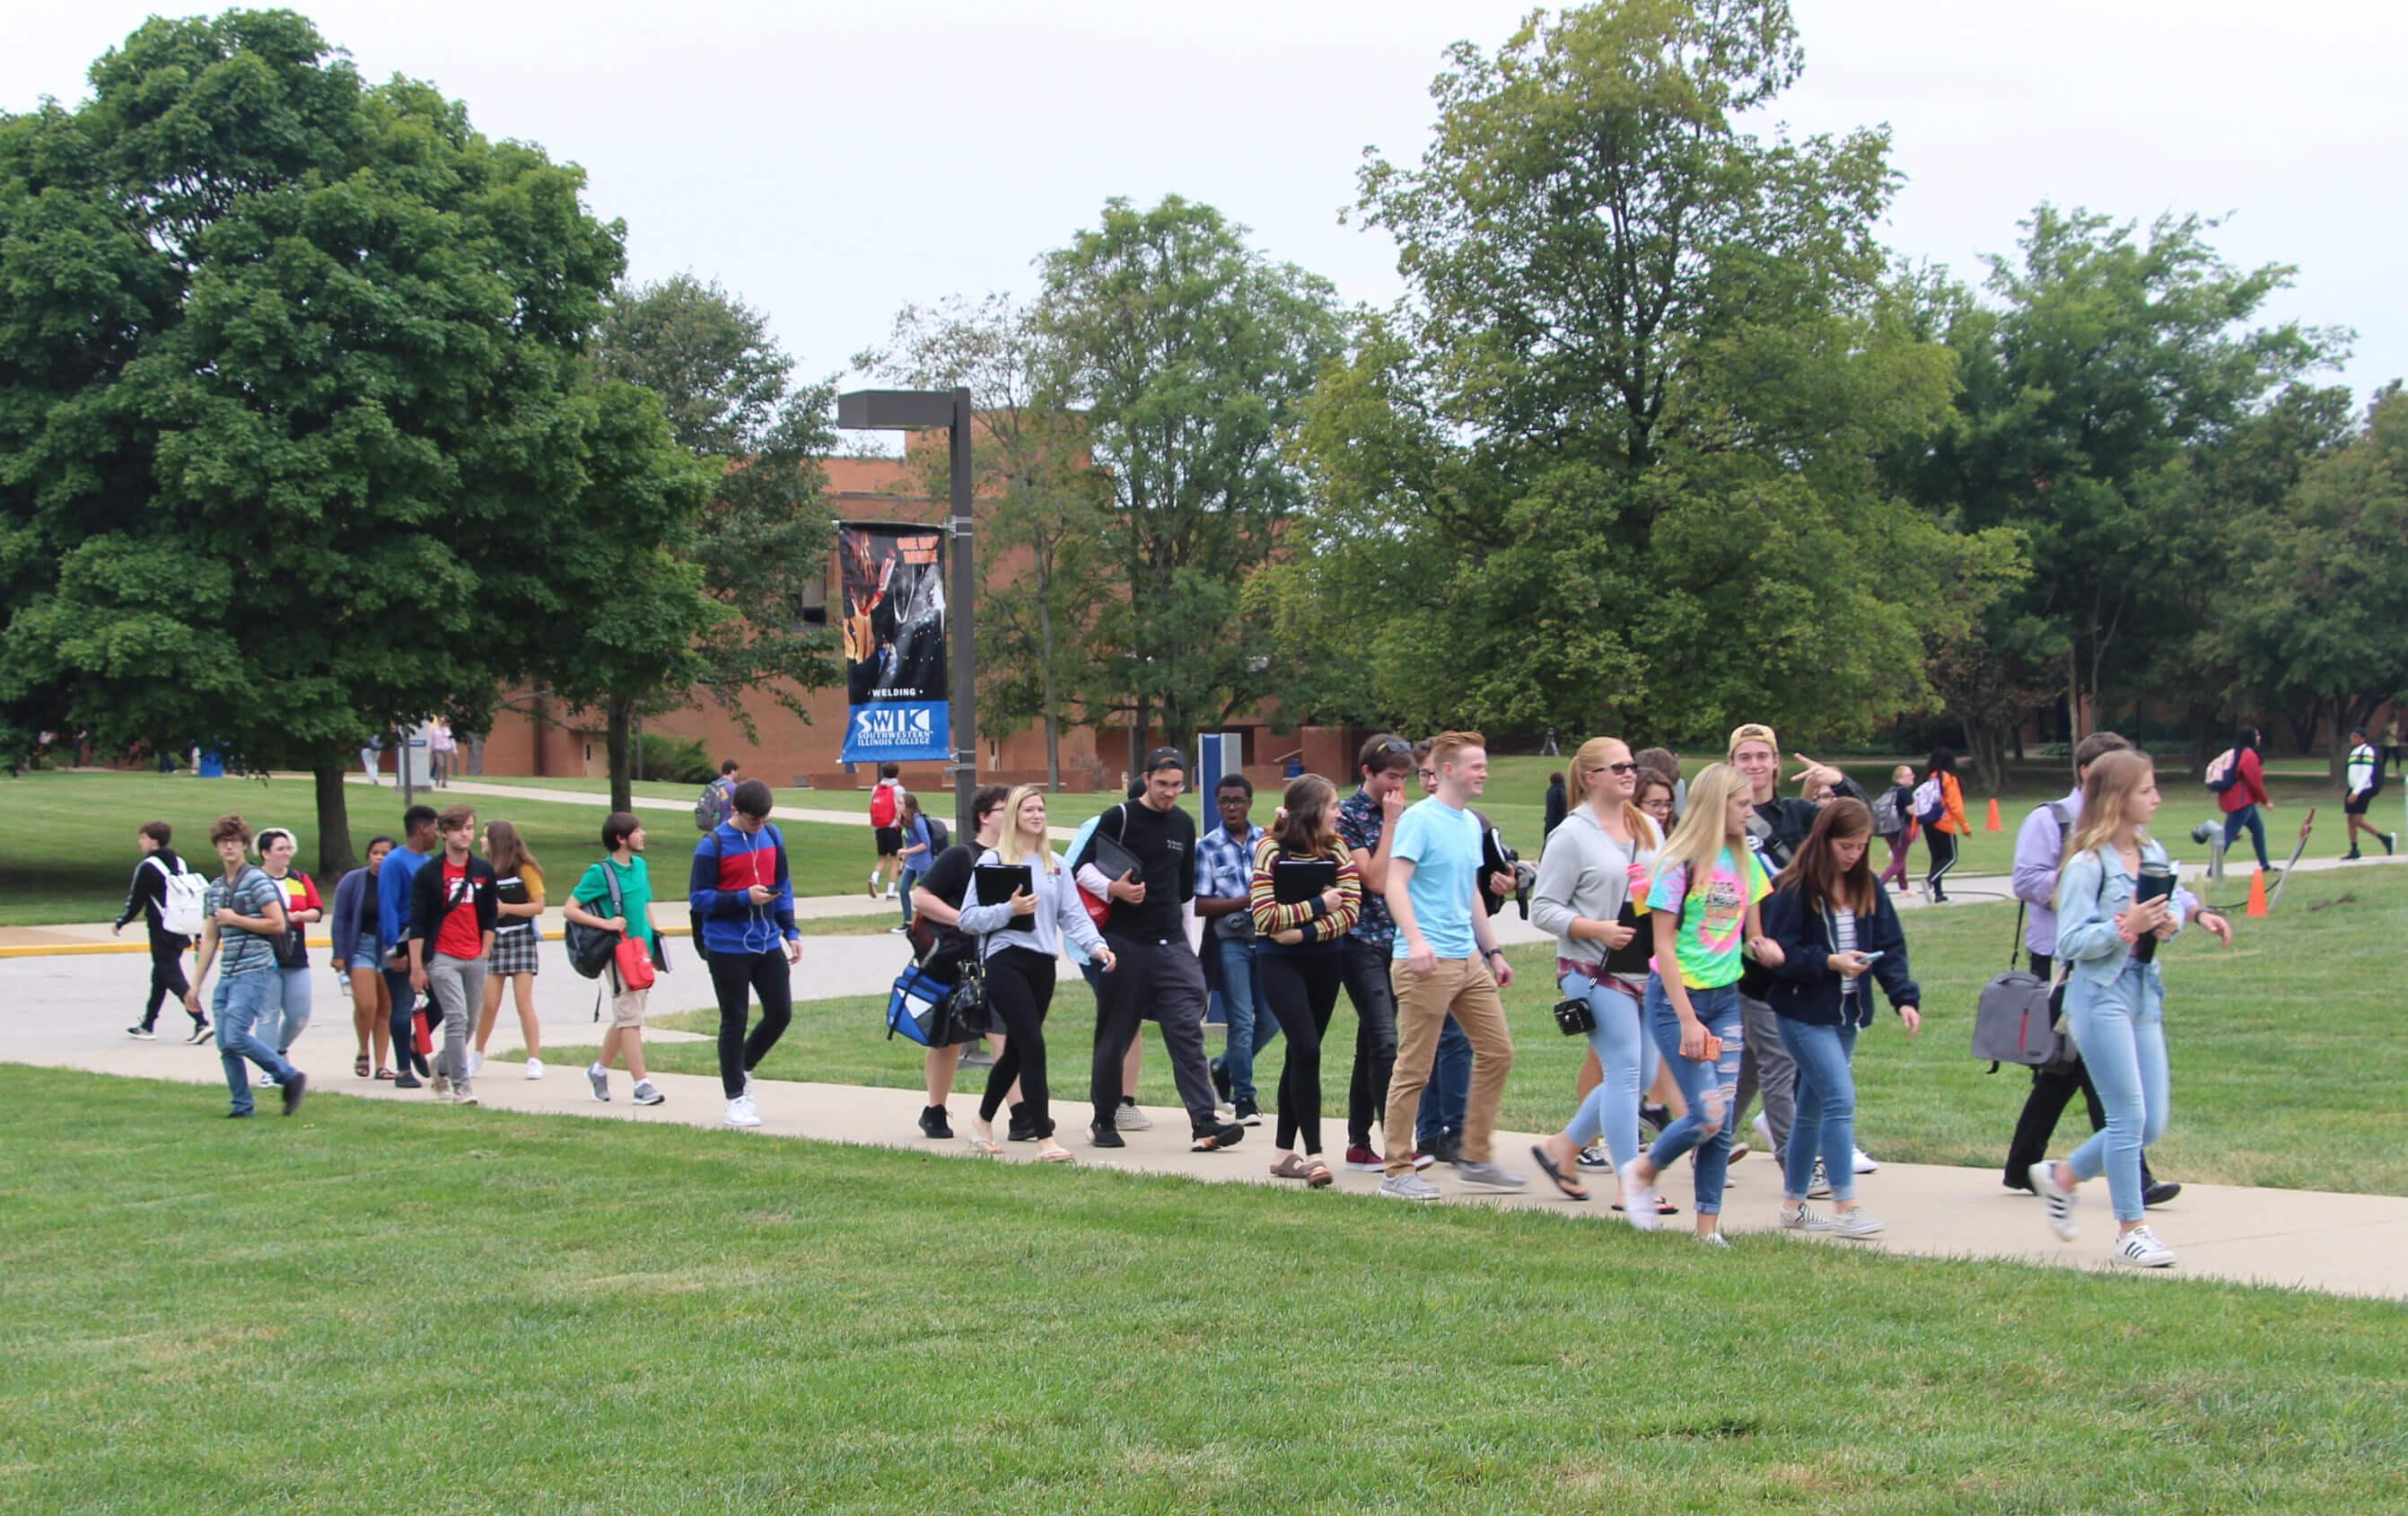 SWIC main campus students on quad